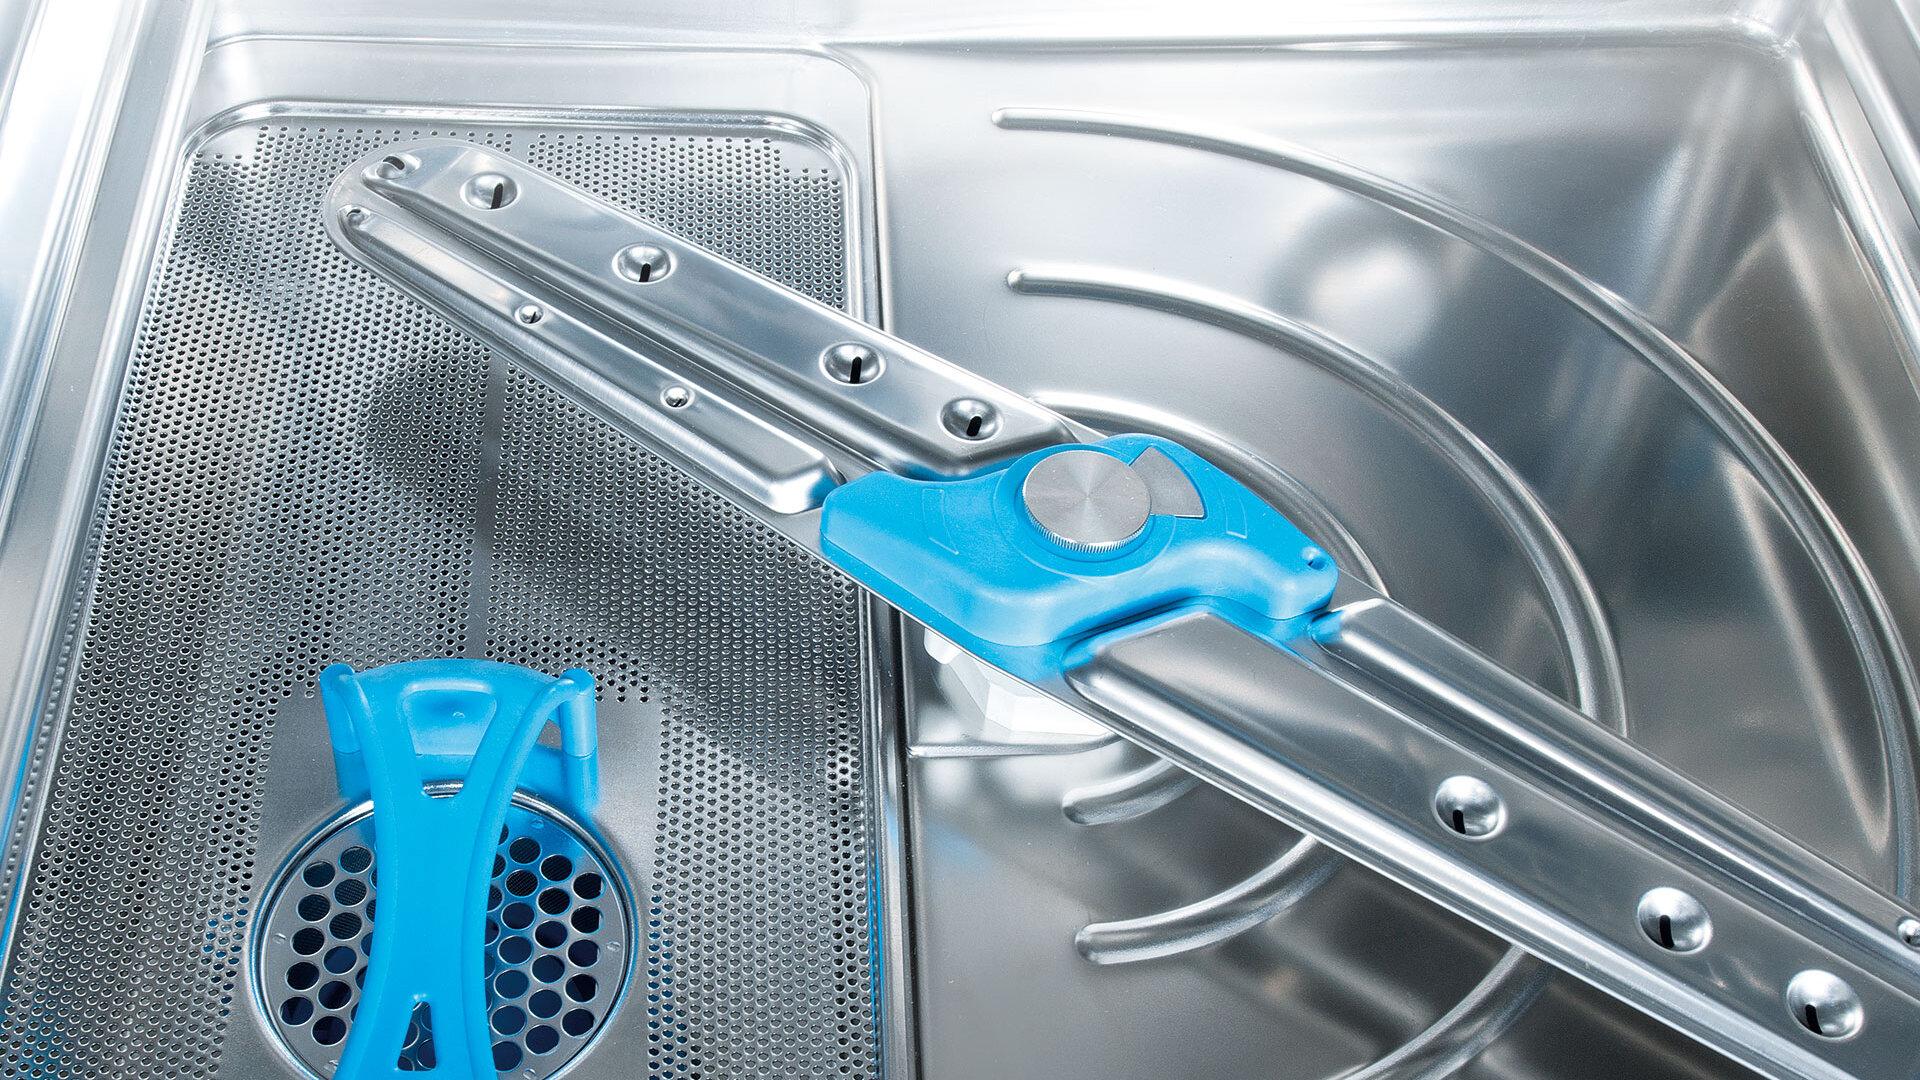 Hotspot gastro dishwasher